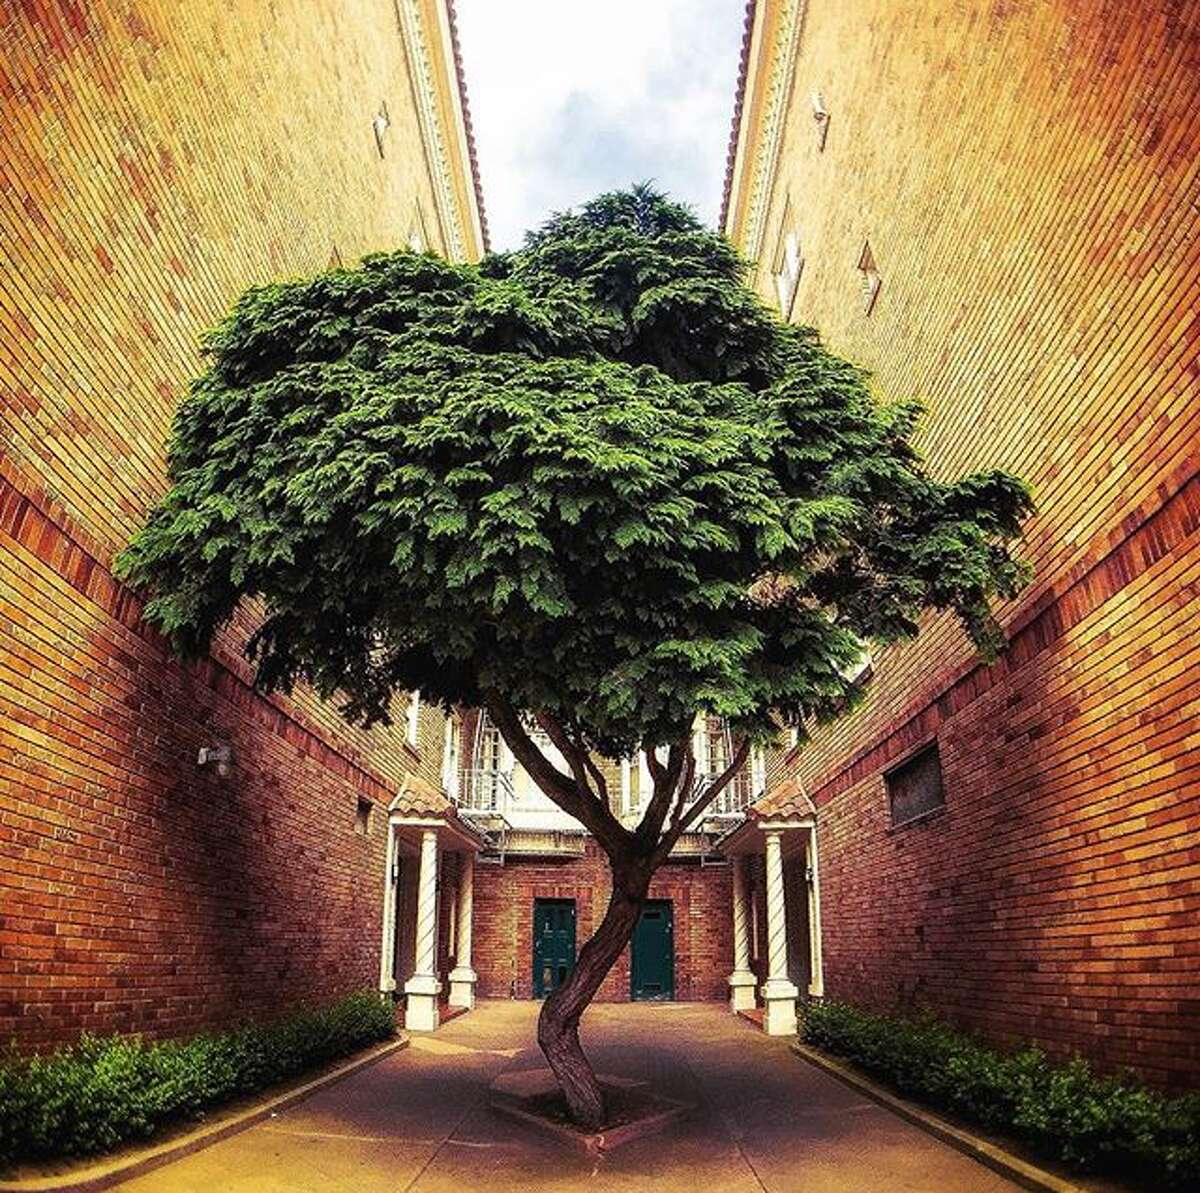 @brukdahl loves this tree in San Francisco.